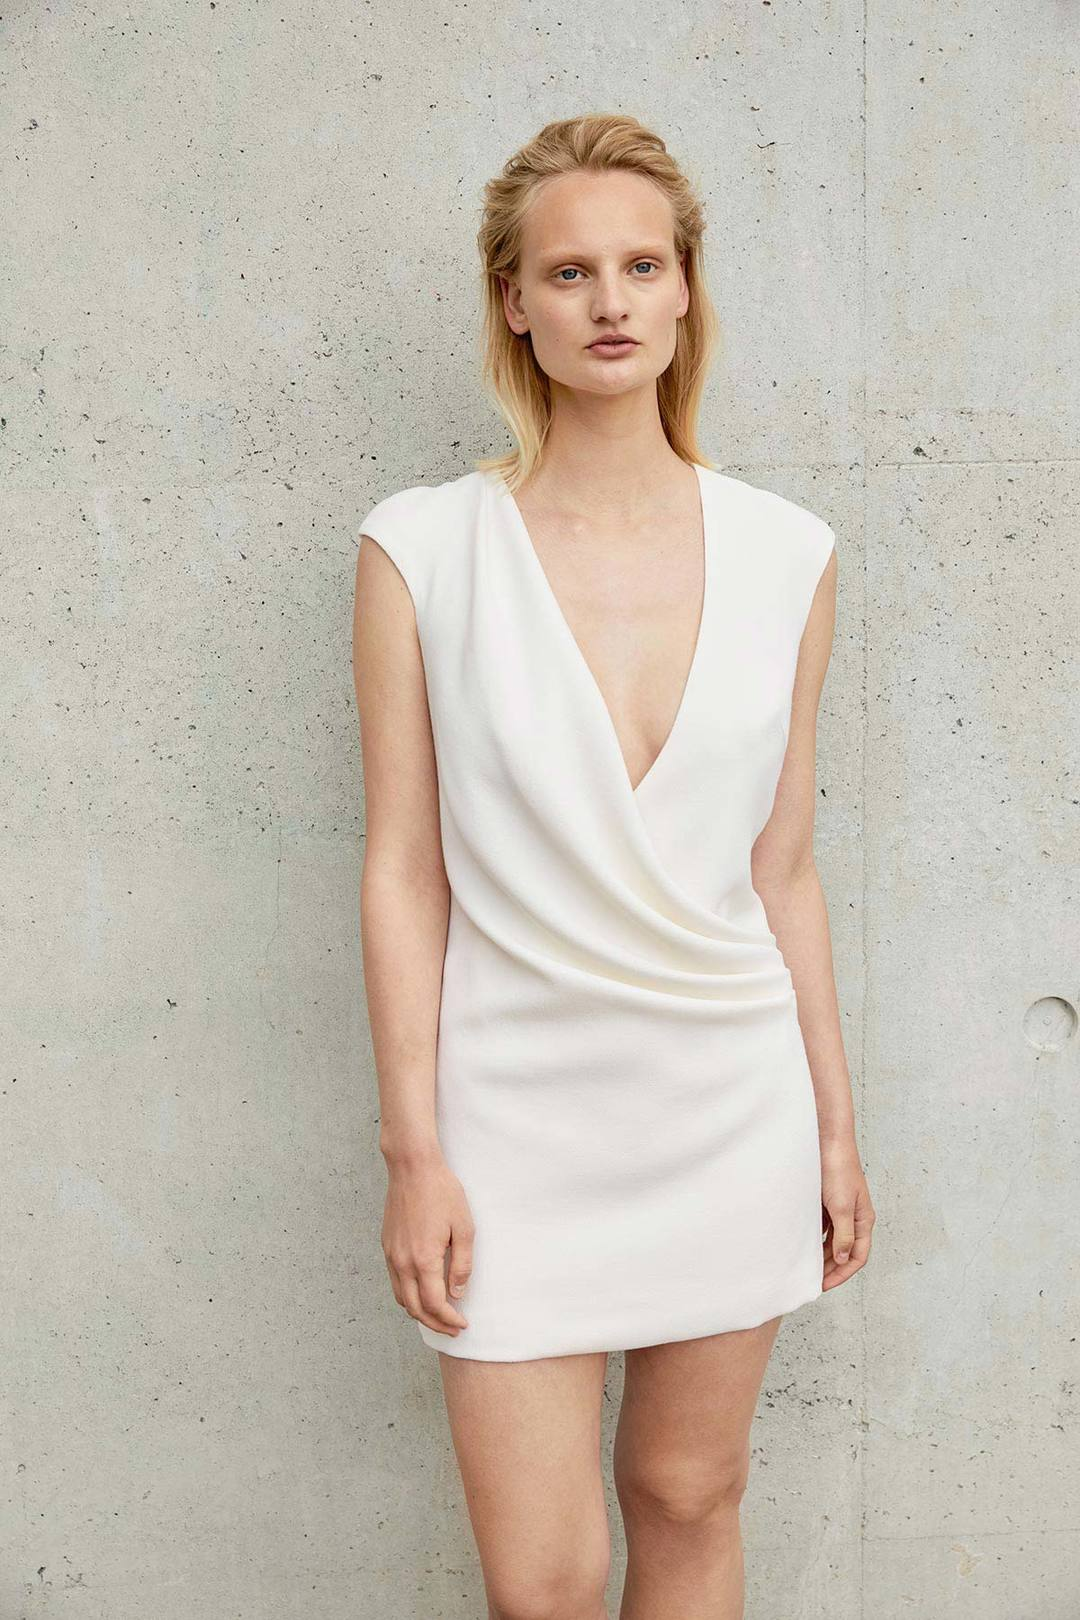 seraphine dress dress photo